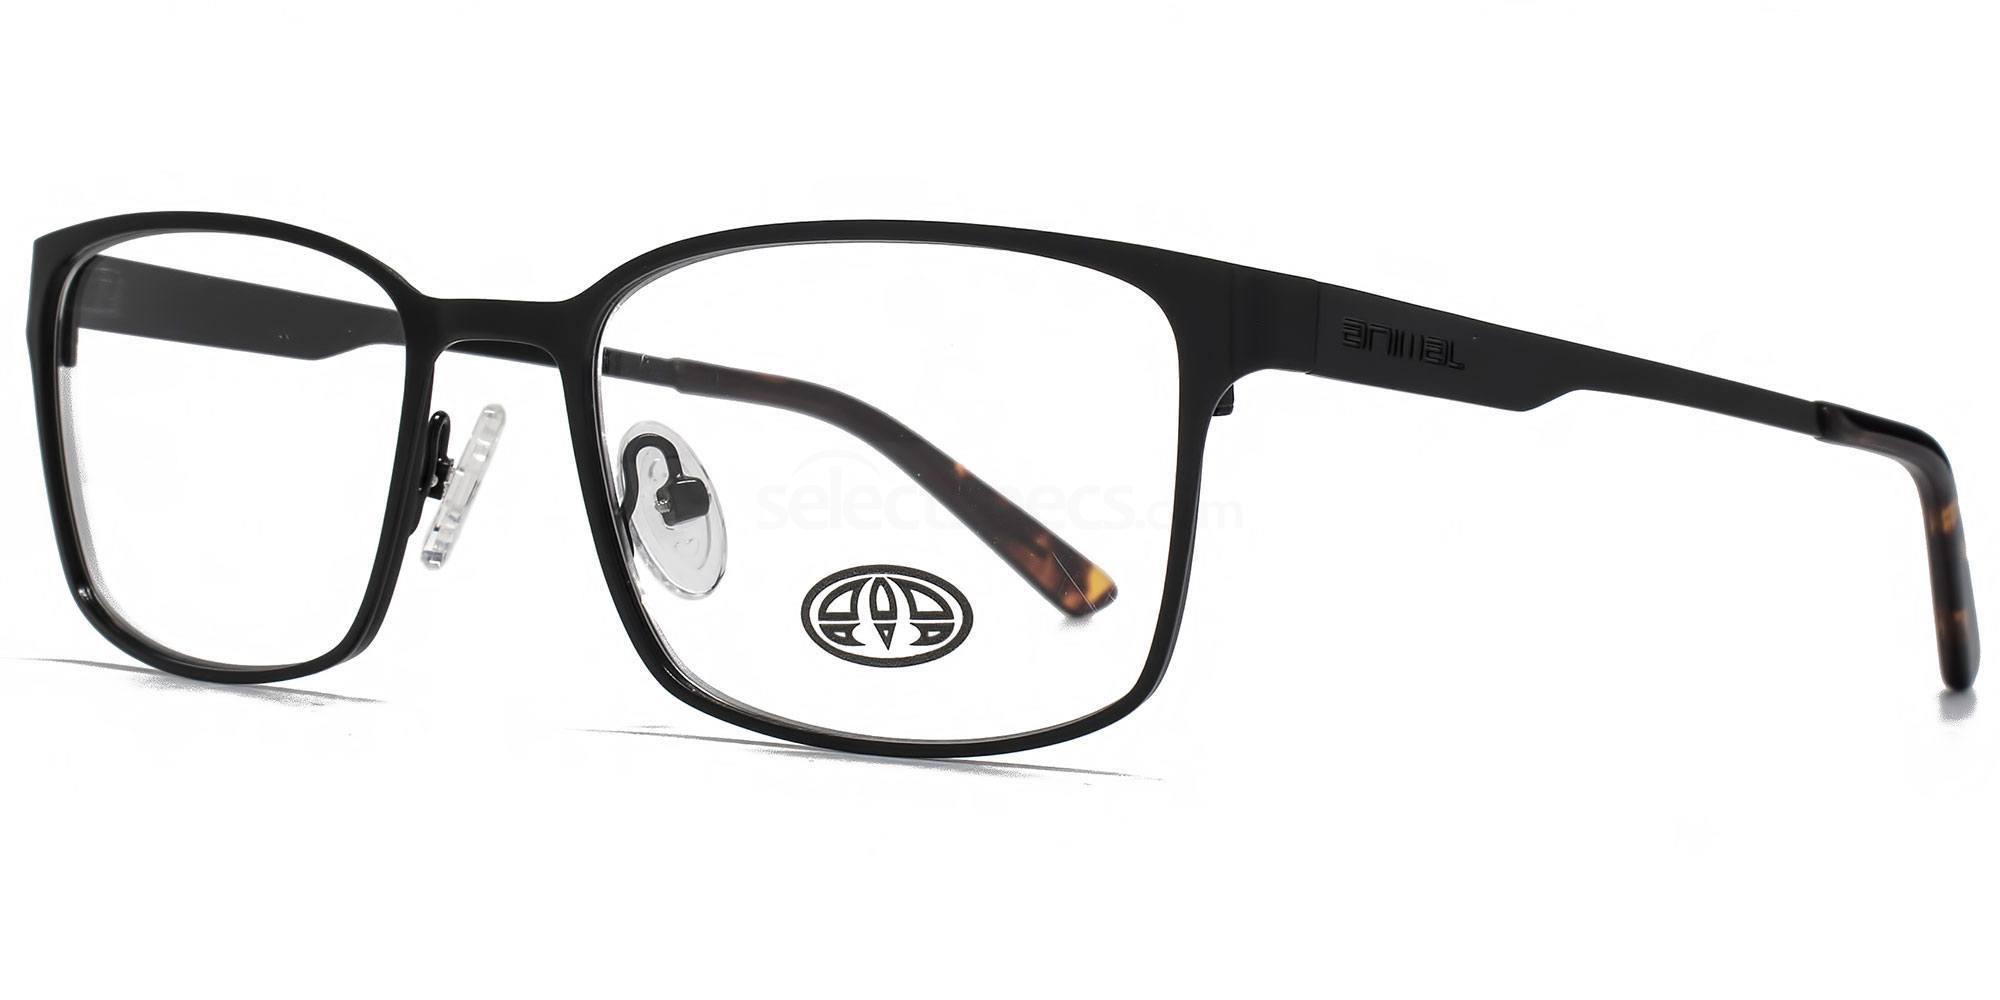 BLK ANIS012 - SIMMONDS Glasses, Animal